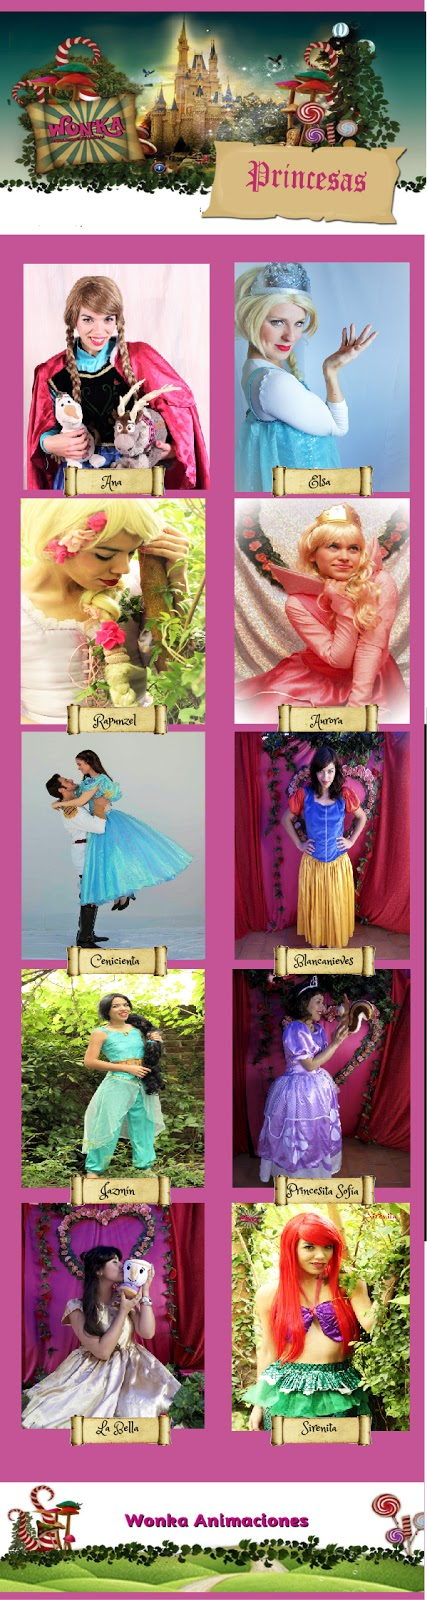 show de princesas, animacion tematica de princesas